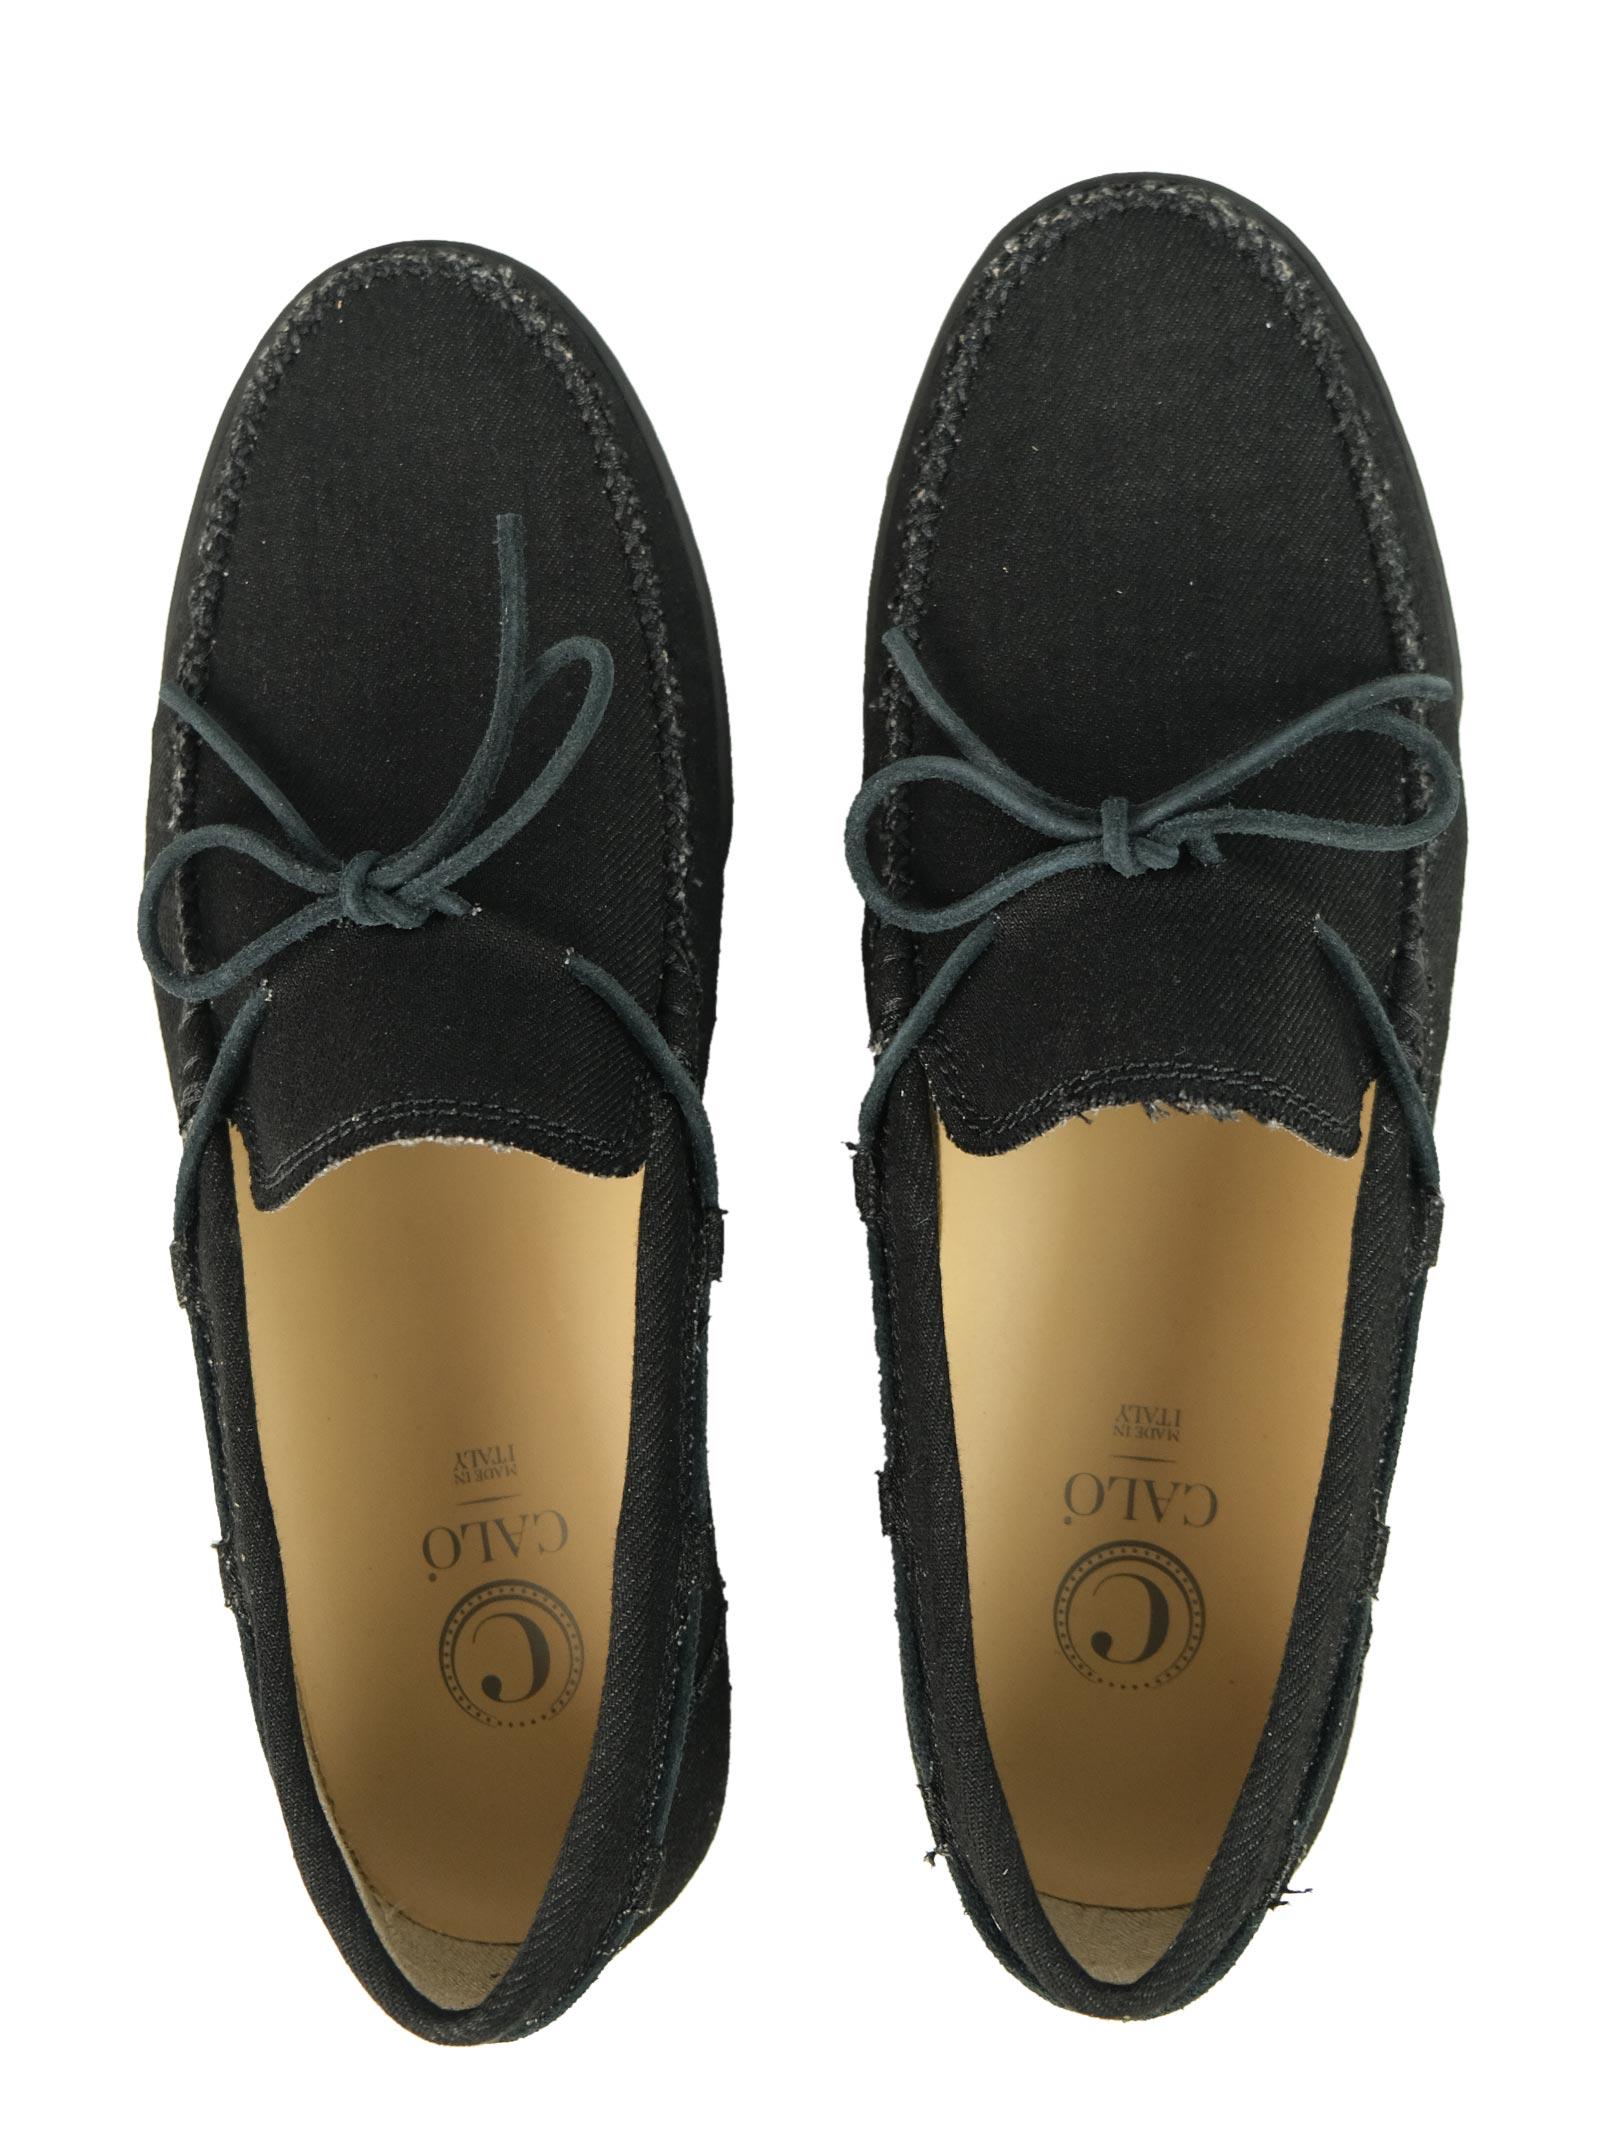 Calò | Shoes | DRIVINGBLACK